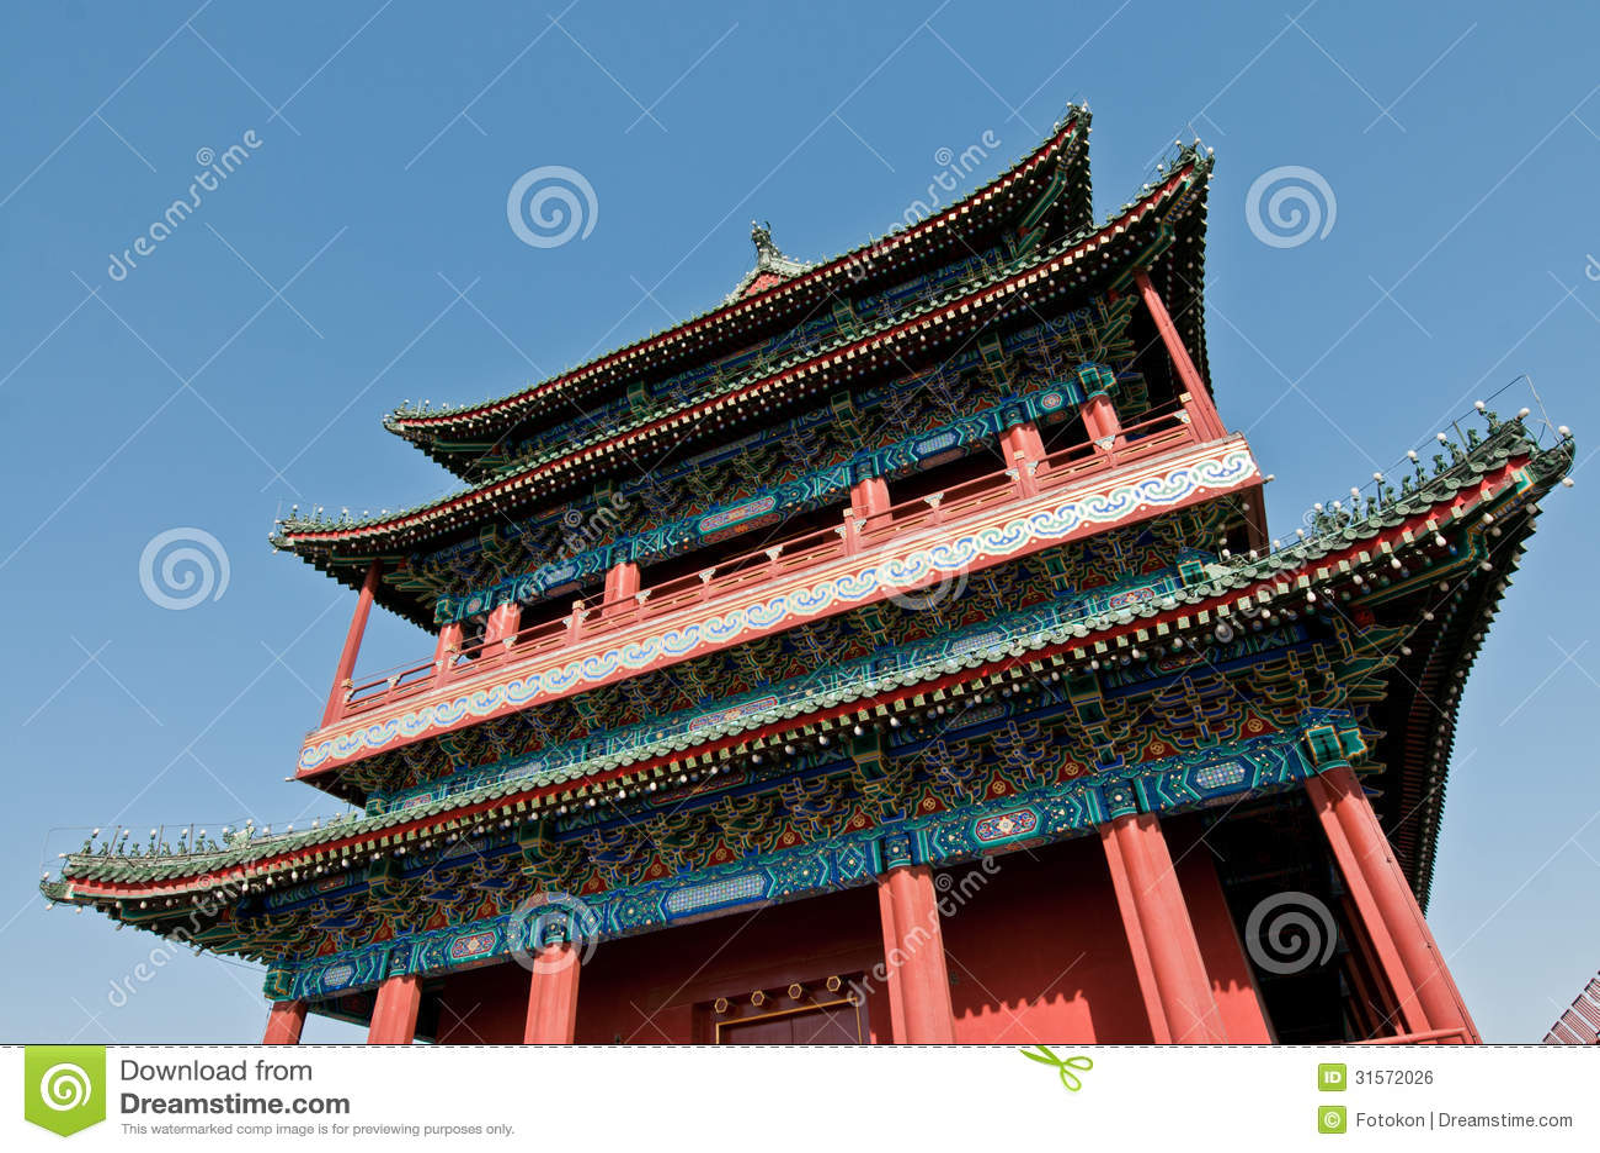 China DIY Travel, Beijing: Address, Phone Number, China DIY Travel Reviews: 5/5